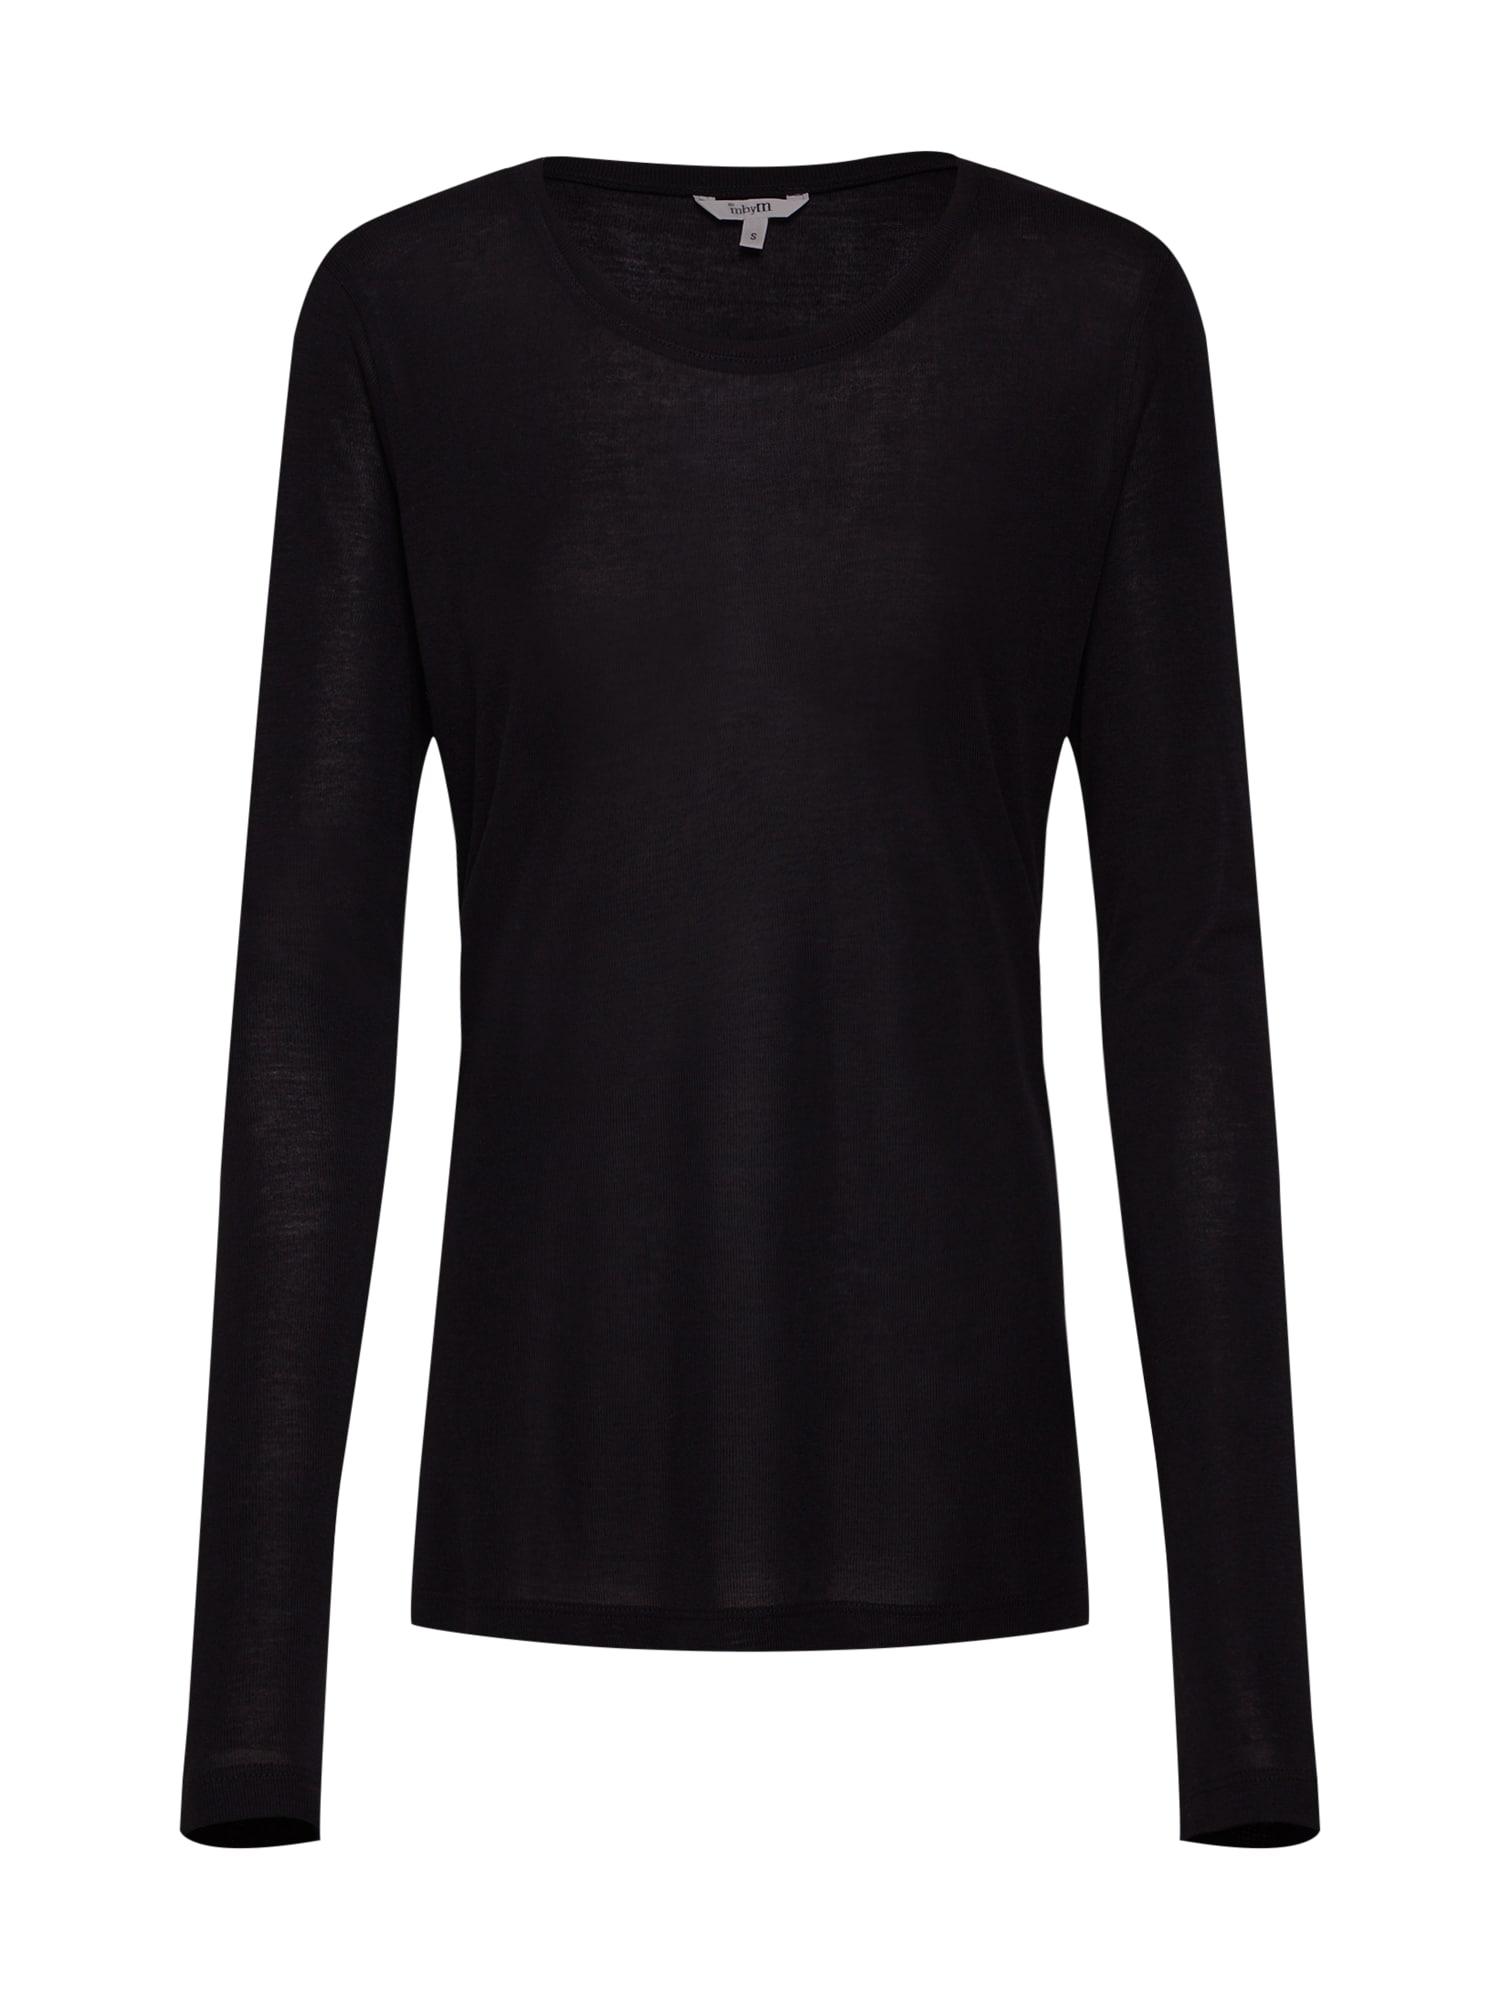 Tričko Lilita černá Mbym